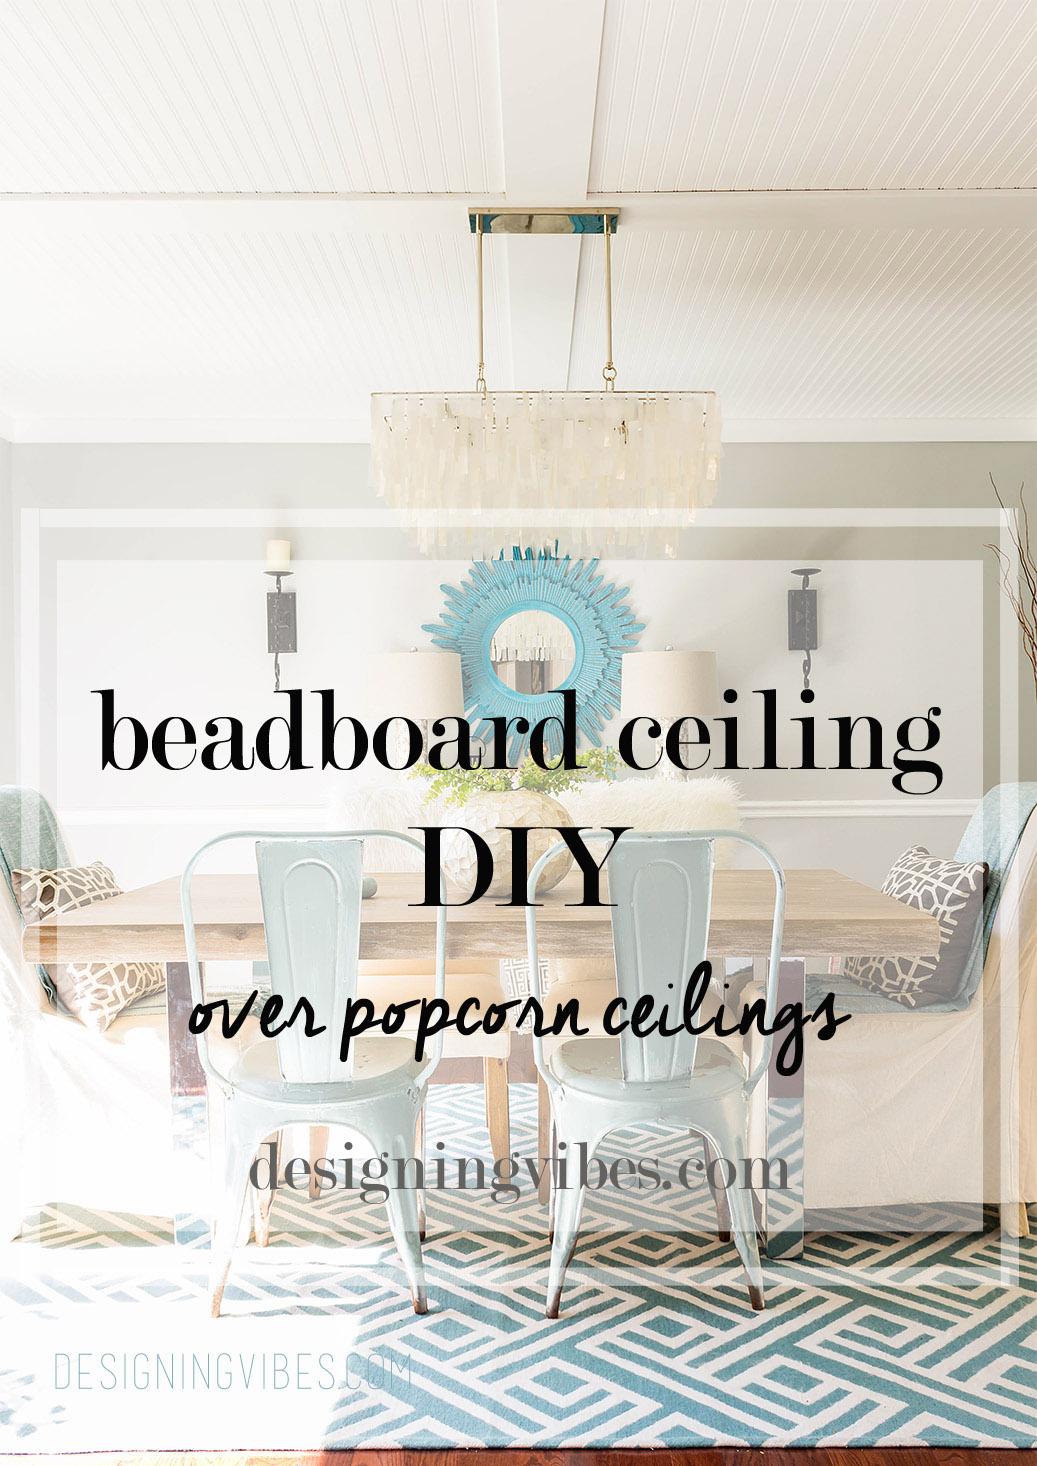 beadboard ceiling over popcorn ceiling diy